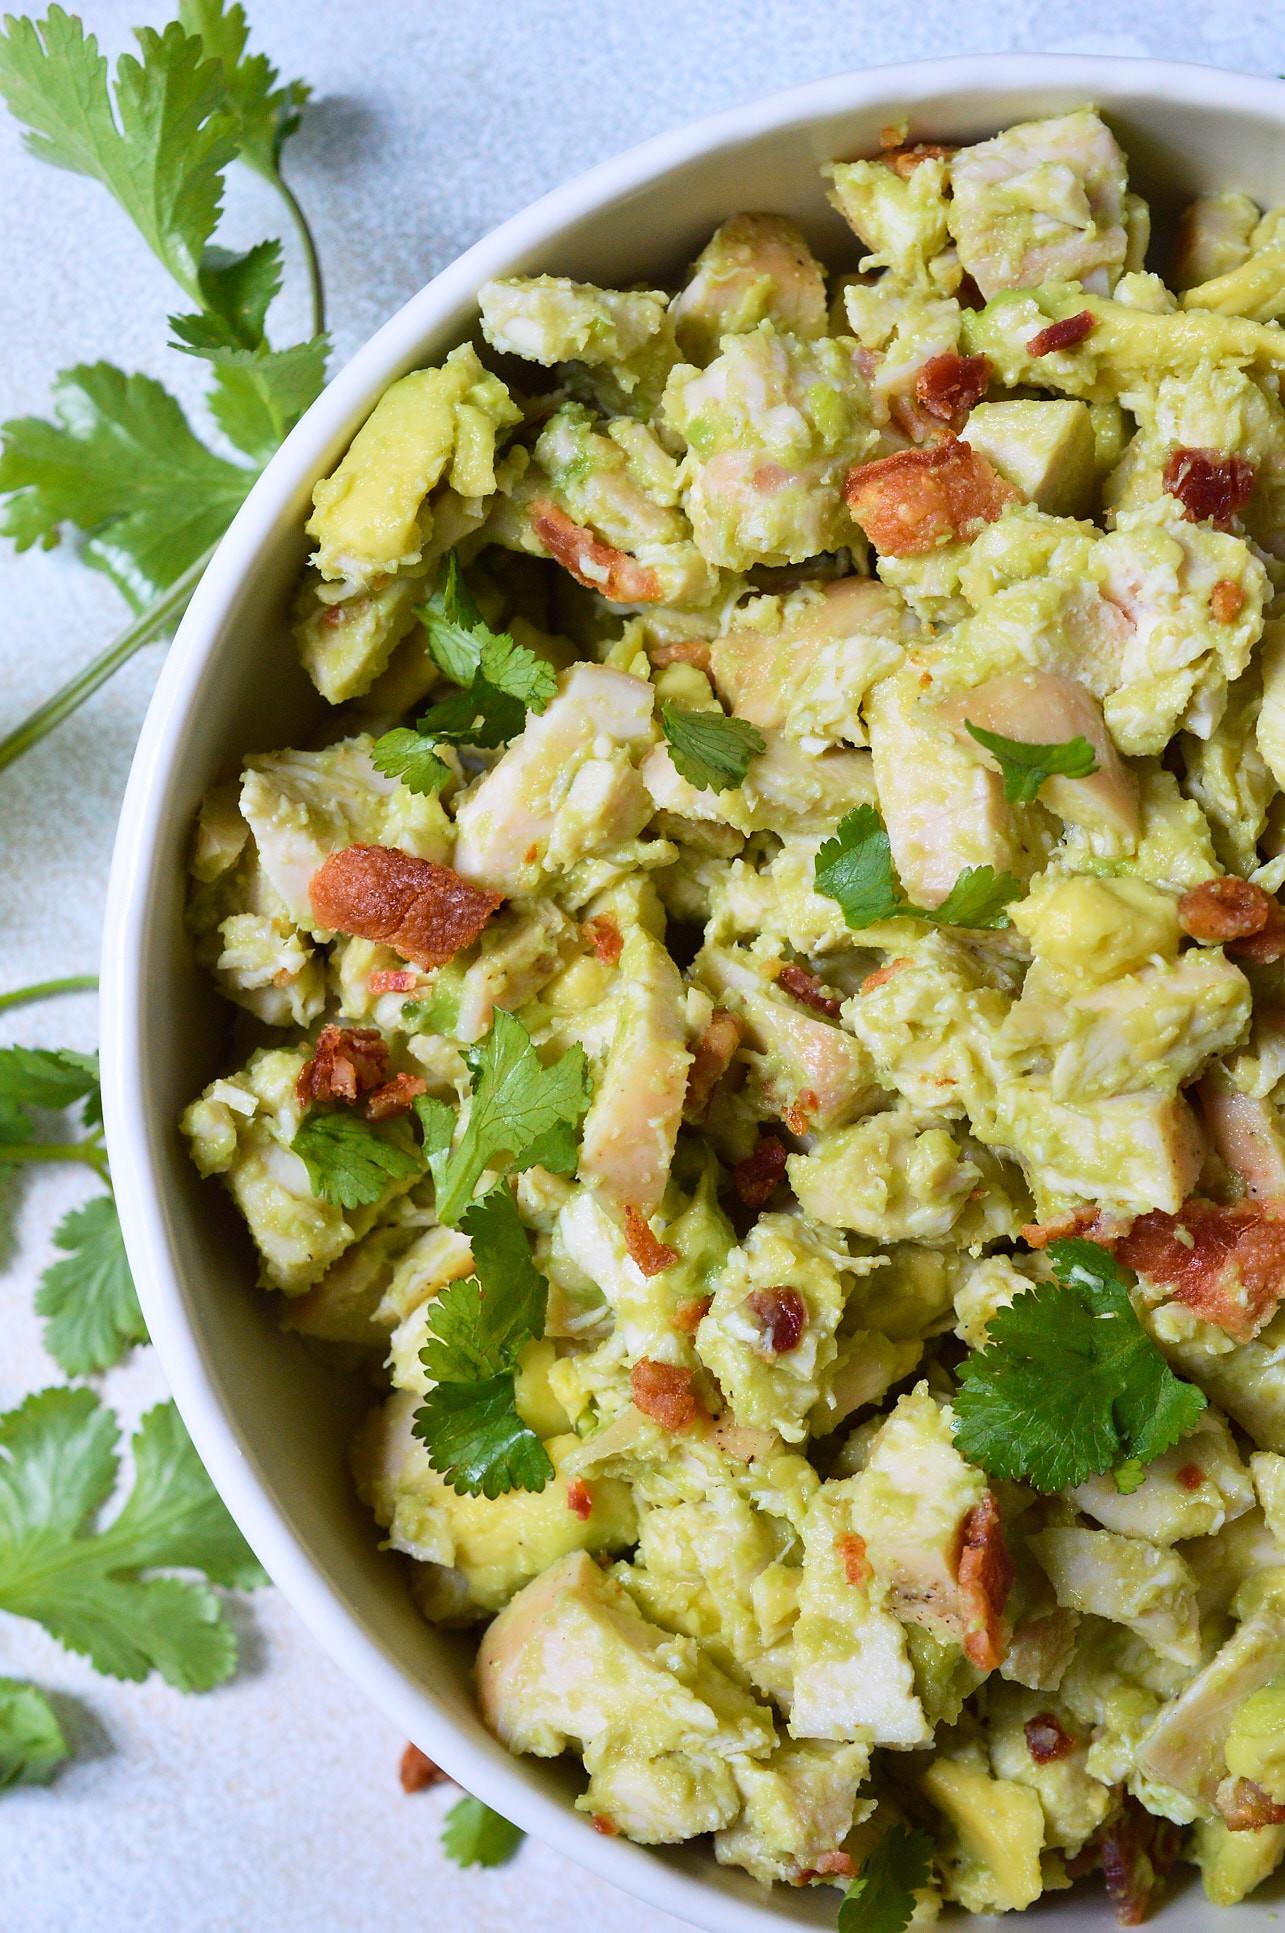 Chicken Salad Healthy  Bacon Avocado Chicken Salad Whole30 Recipe WonkyWonderful